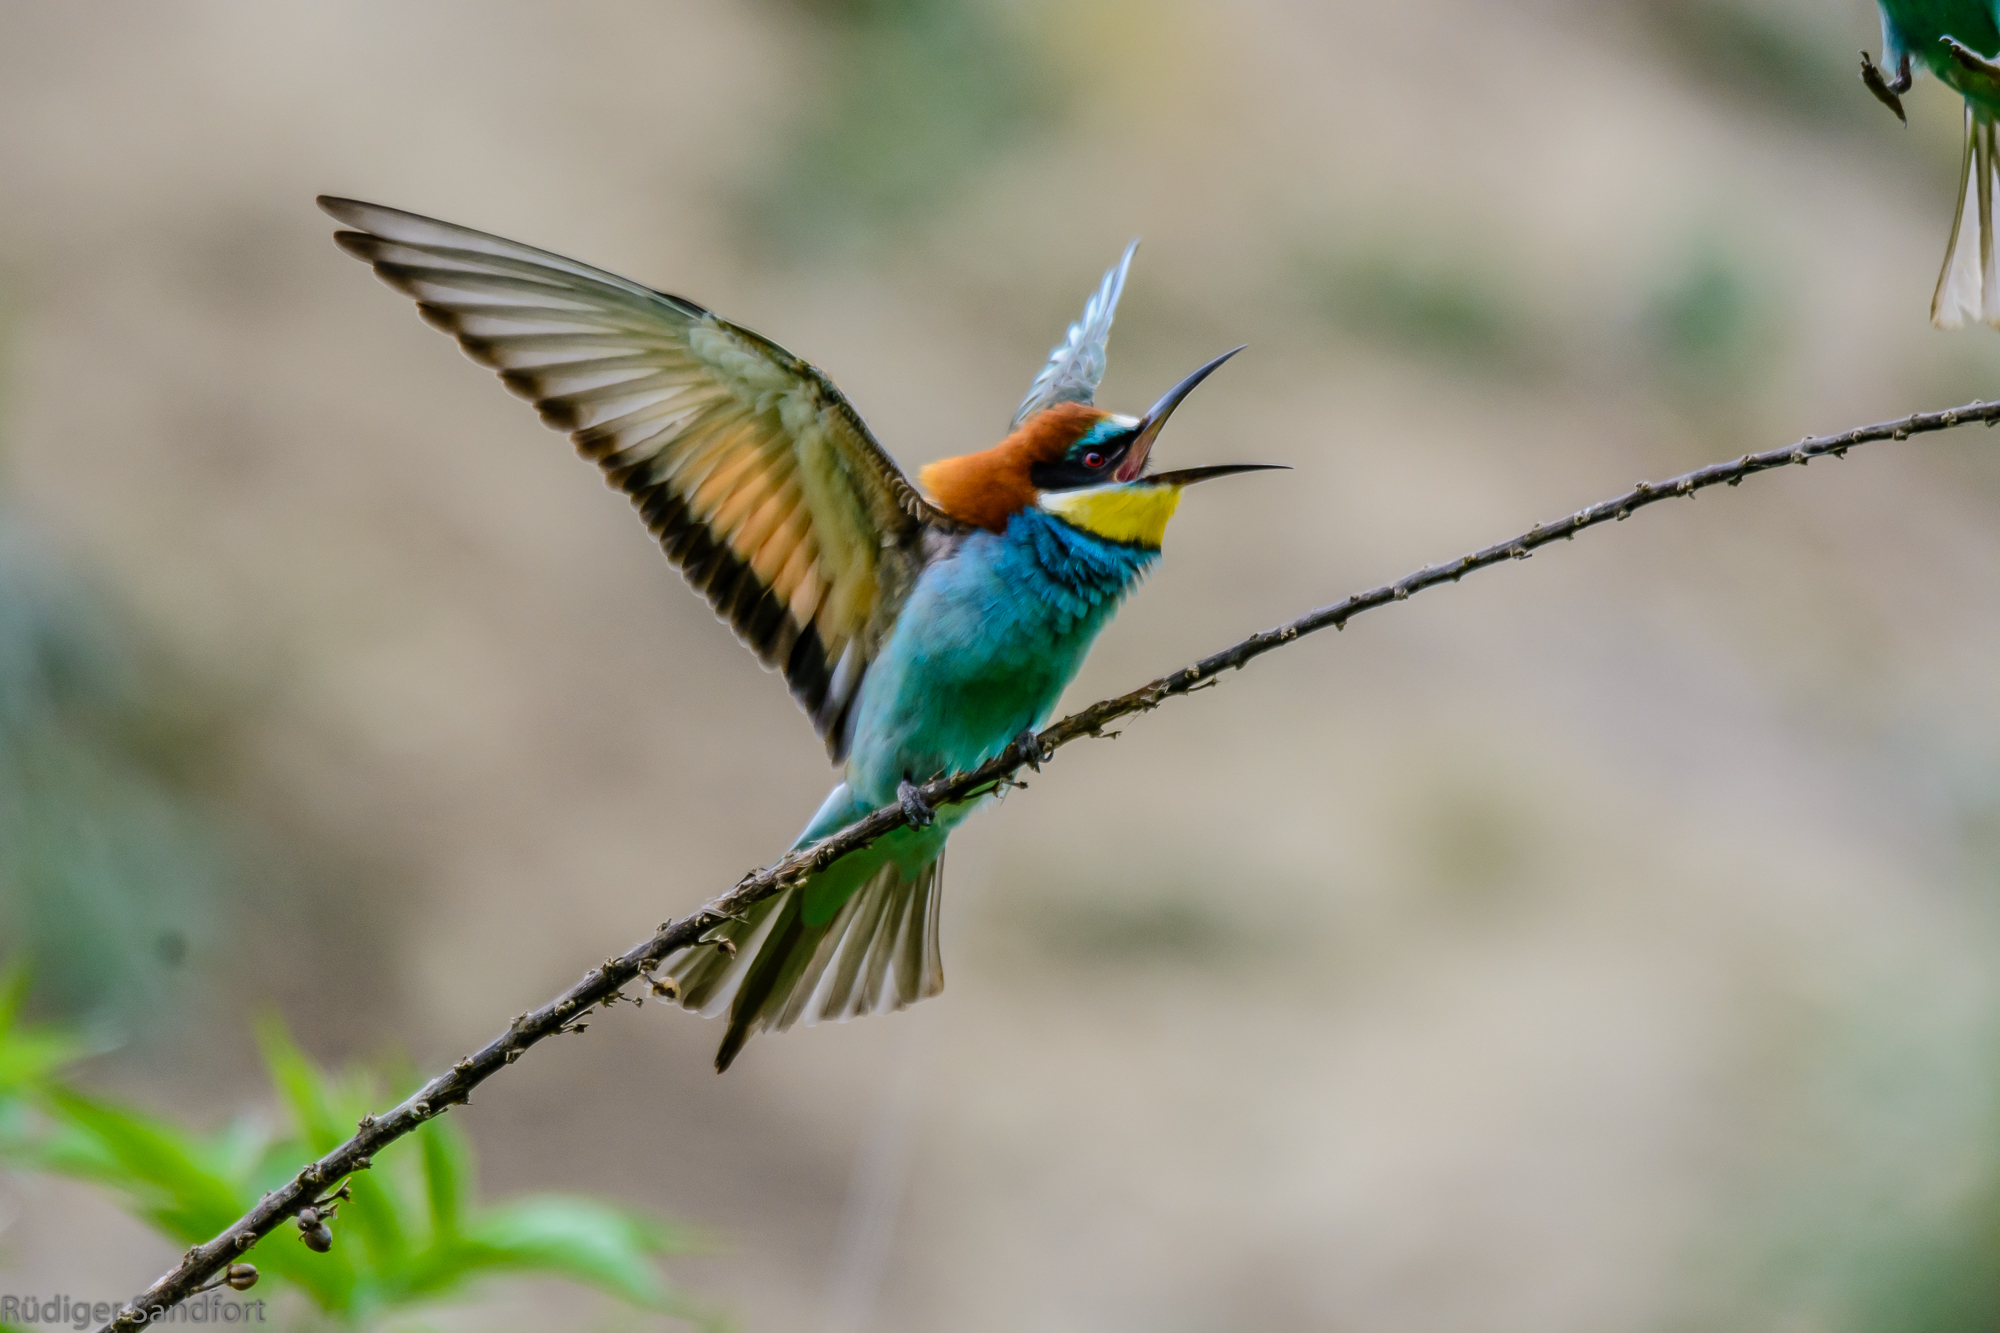 European Bee-eater / Bienenfresser